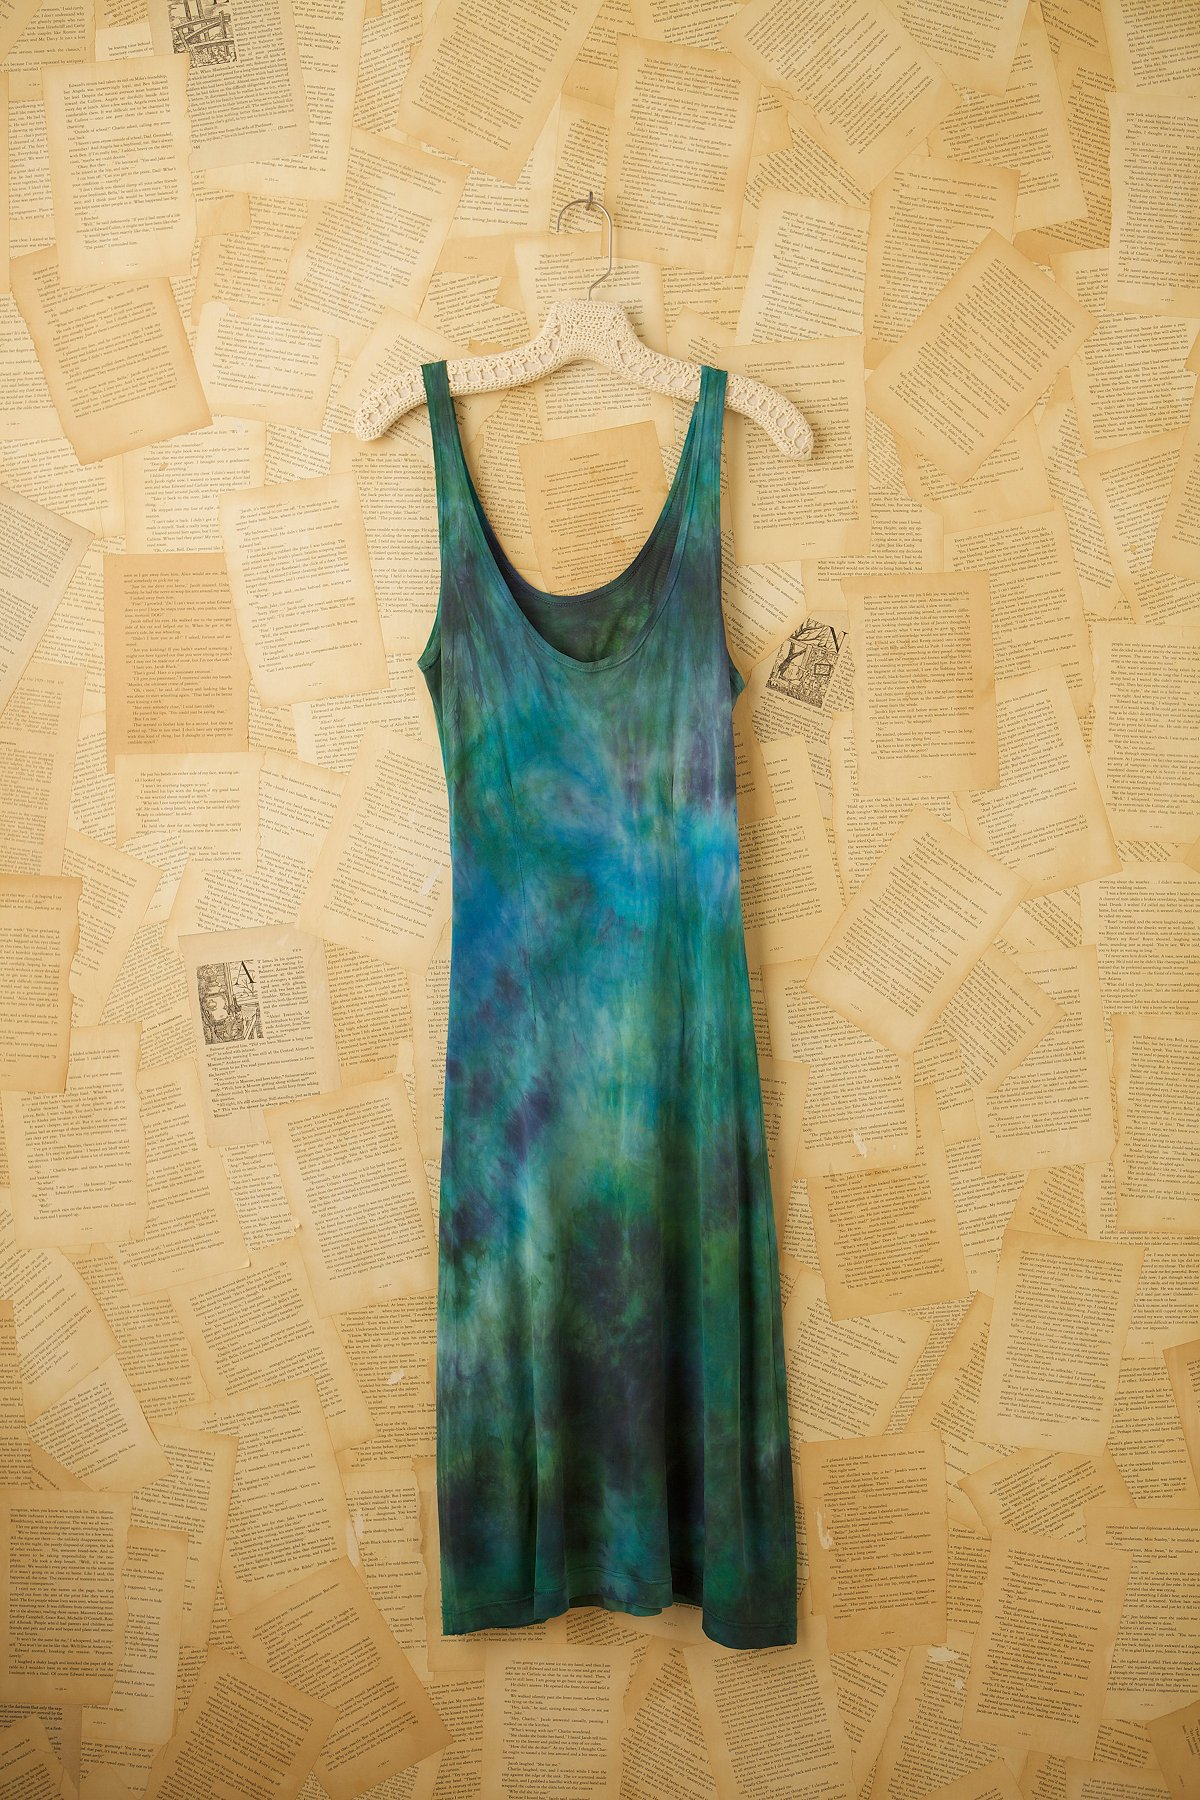 Vintage 1940s Hand Knit Rayon Tank Dress